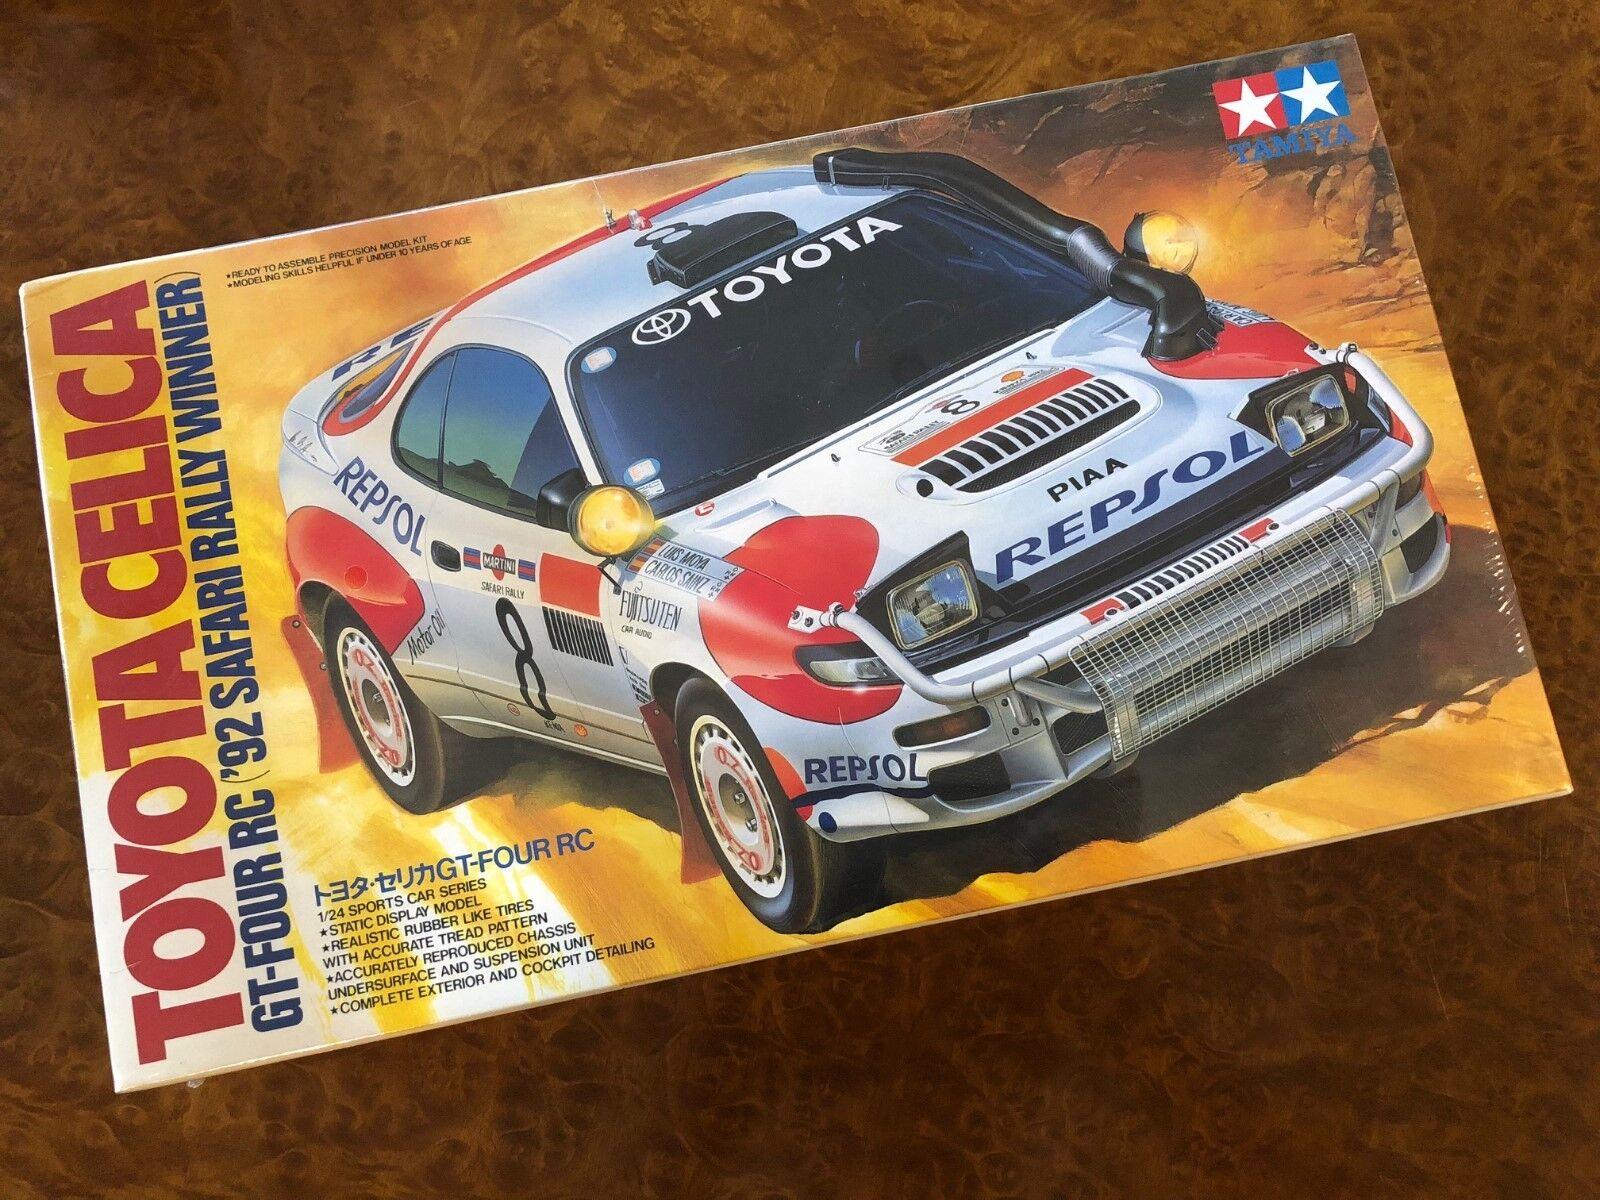 Tamiya 1 24 Repsol leksakota Celica Gt -Four Rc 1 a rally Safari Scatola Sigillata